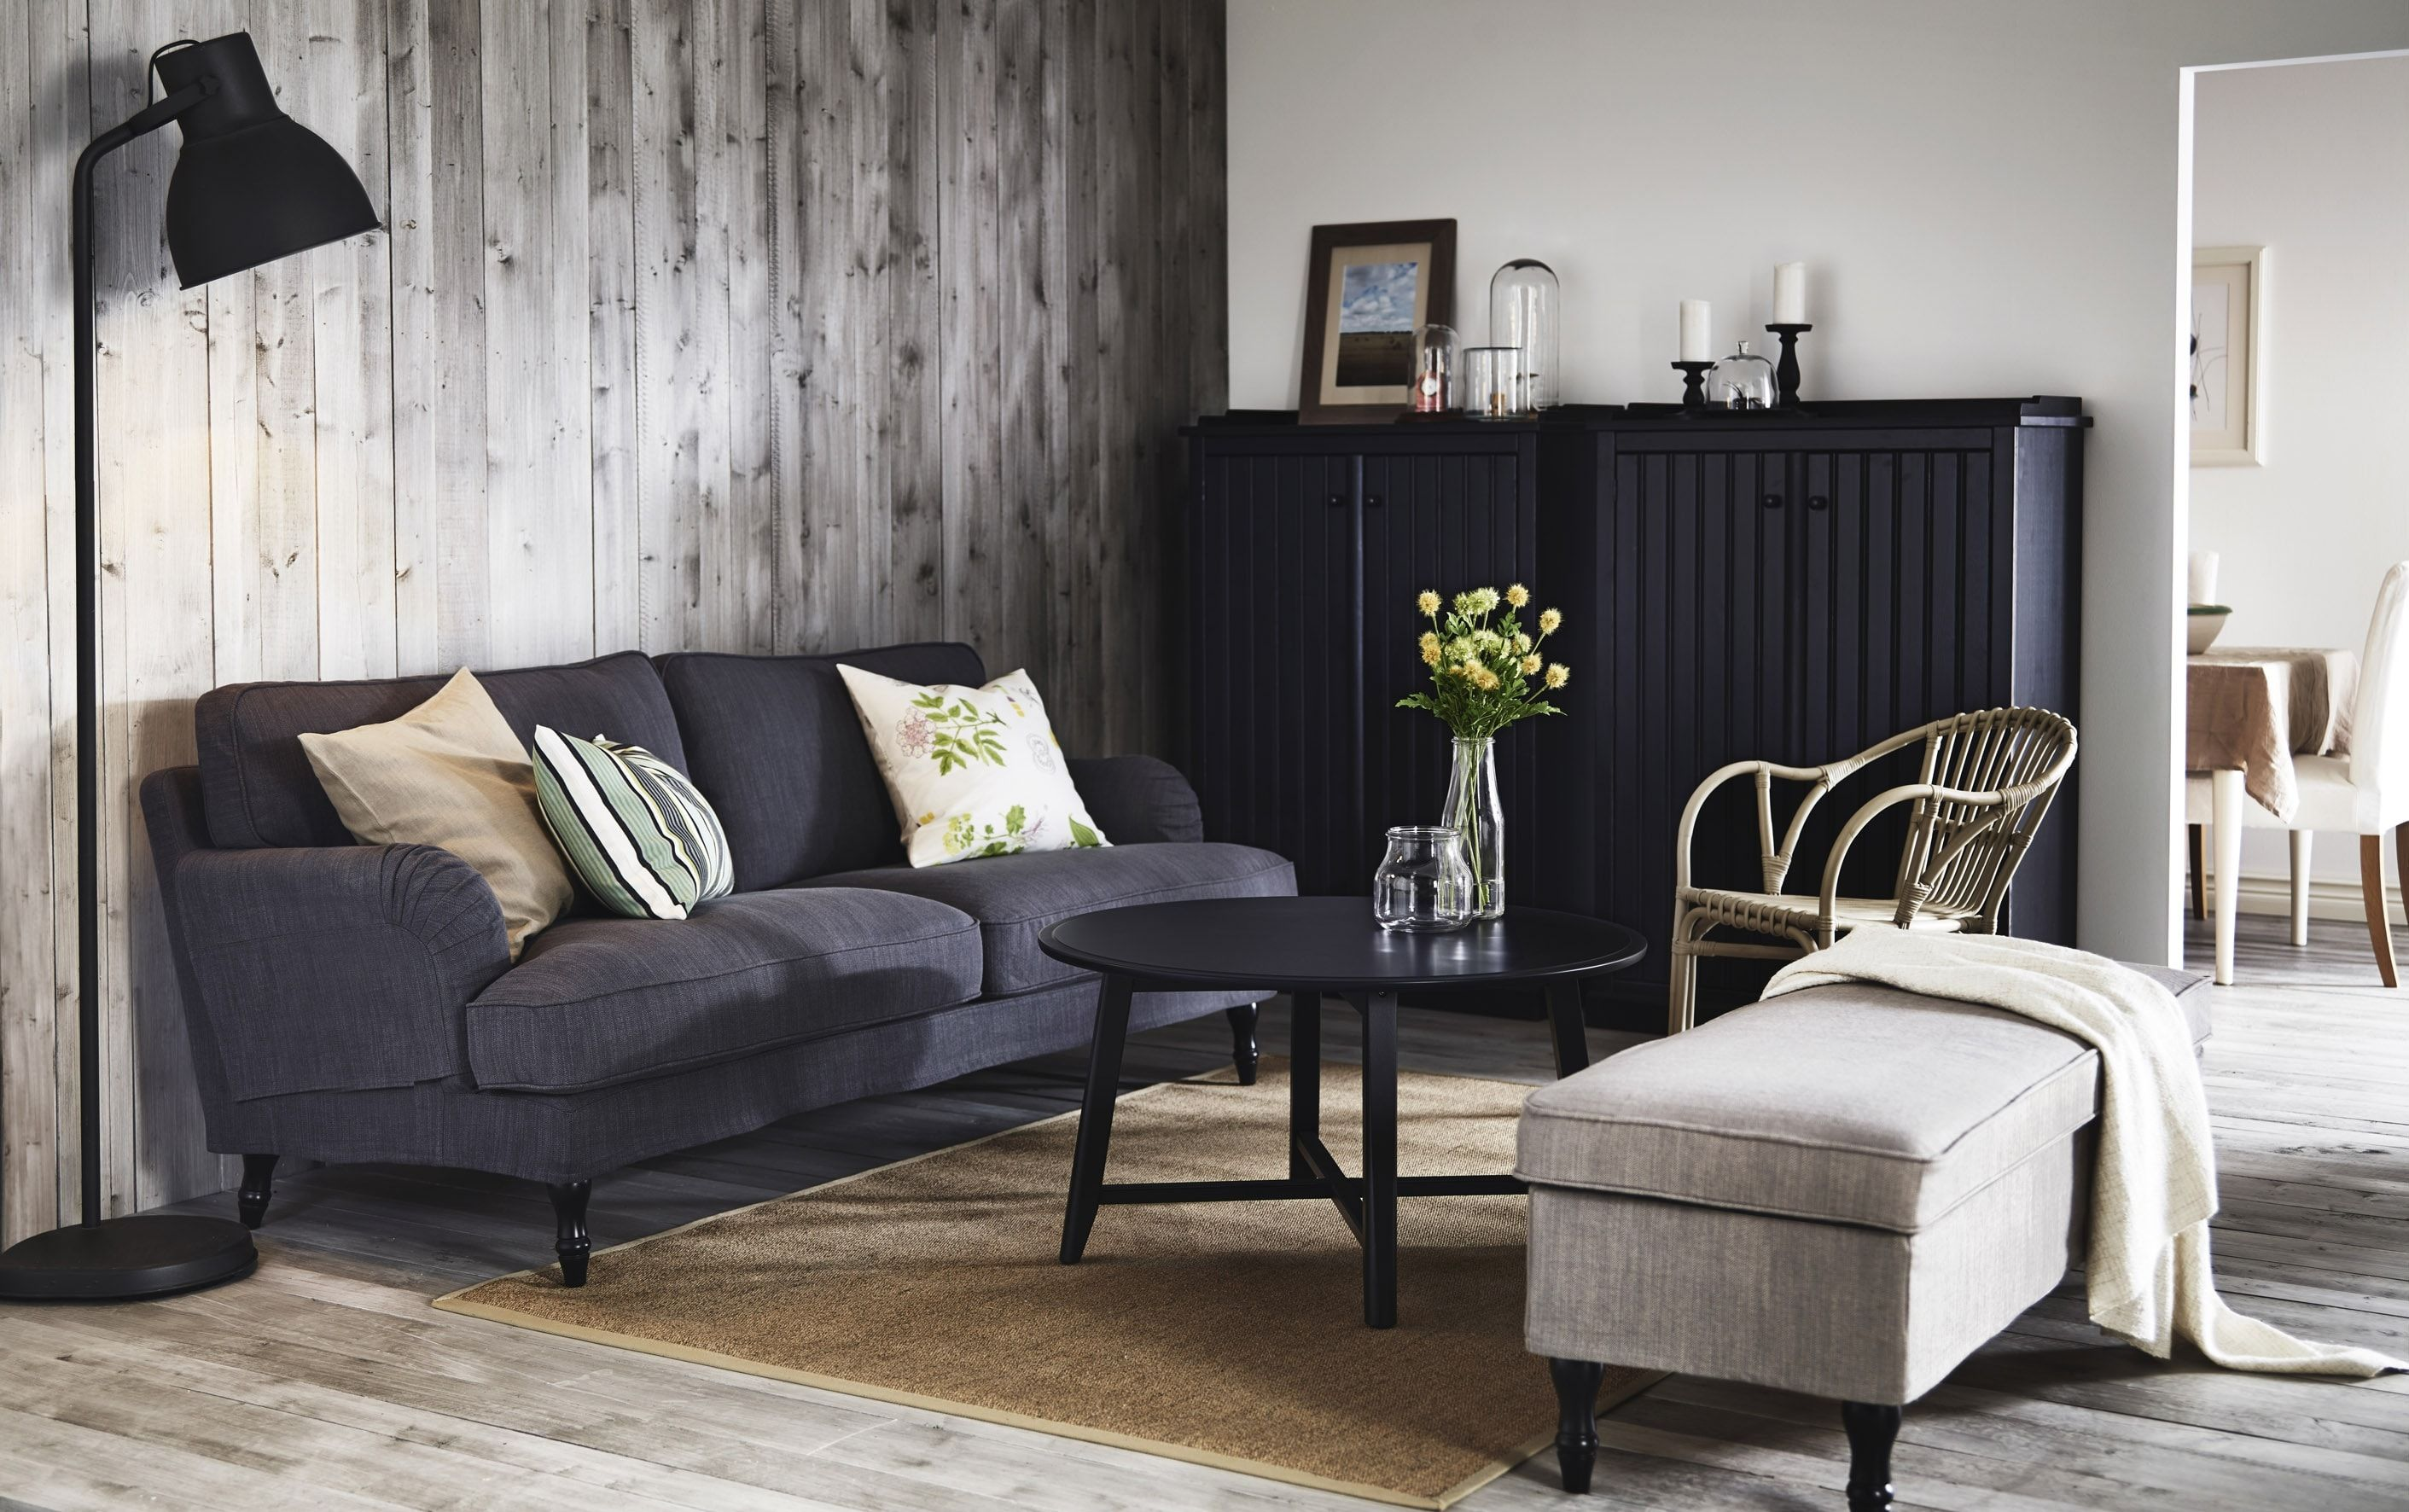 Canapé Places Stocksund IKEA Déco Salonsalle à Manger - Canapé 3 places pour deco salle a manger salon